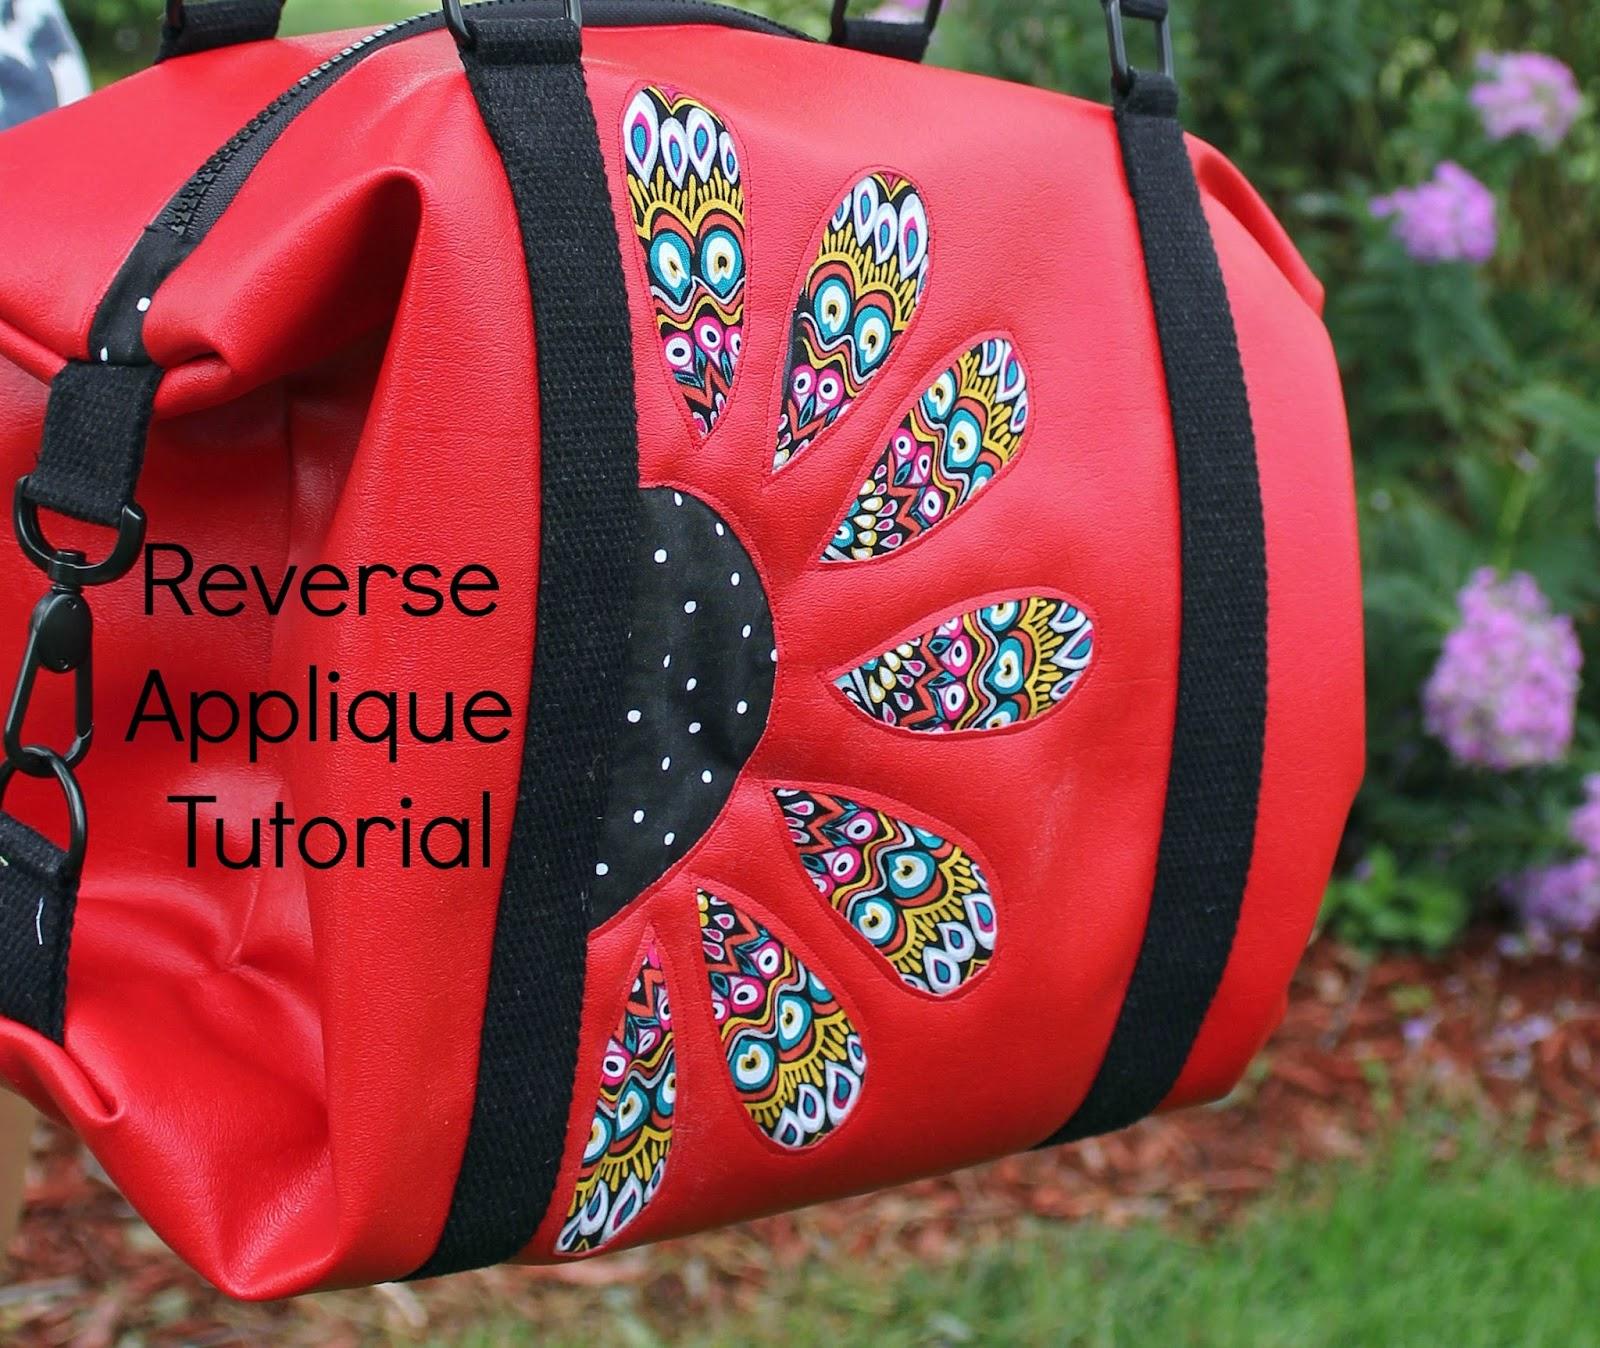 Reverse Applique Tutorial | Girls in the Garden